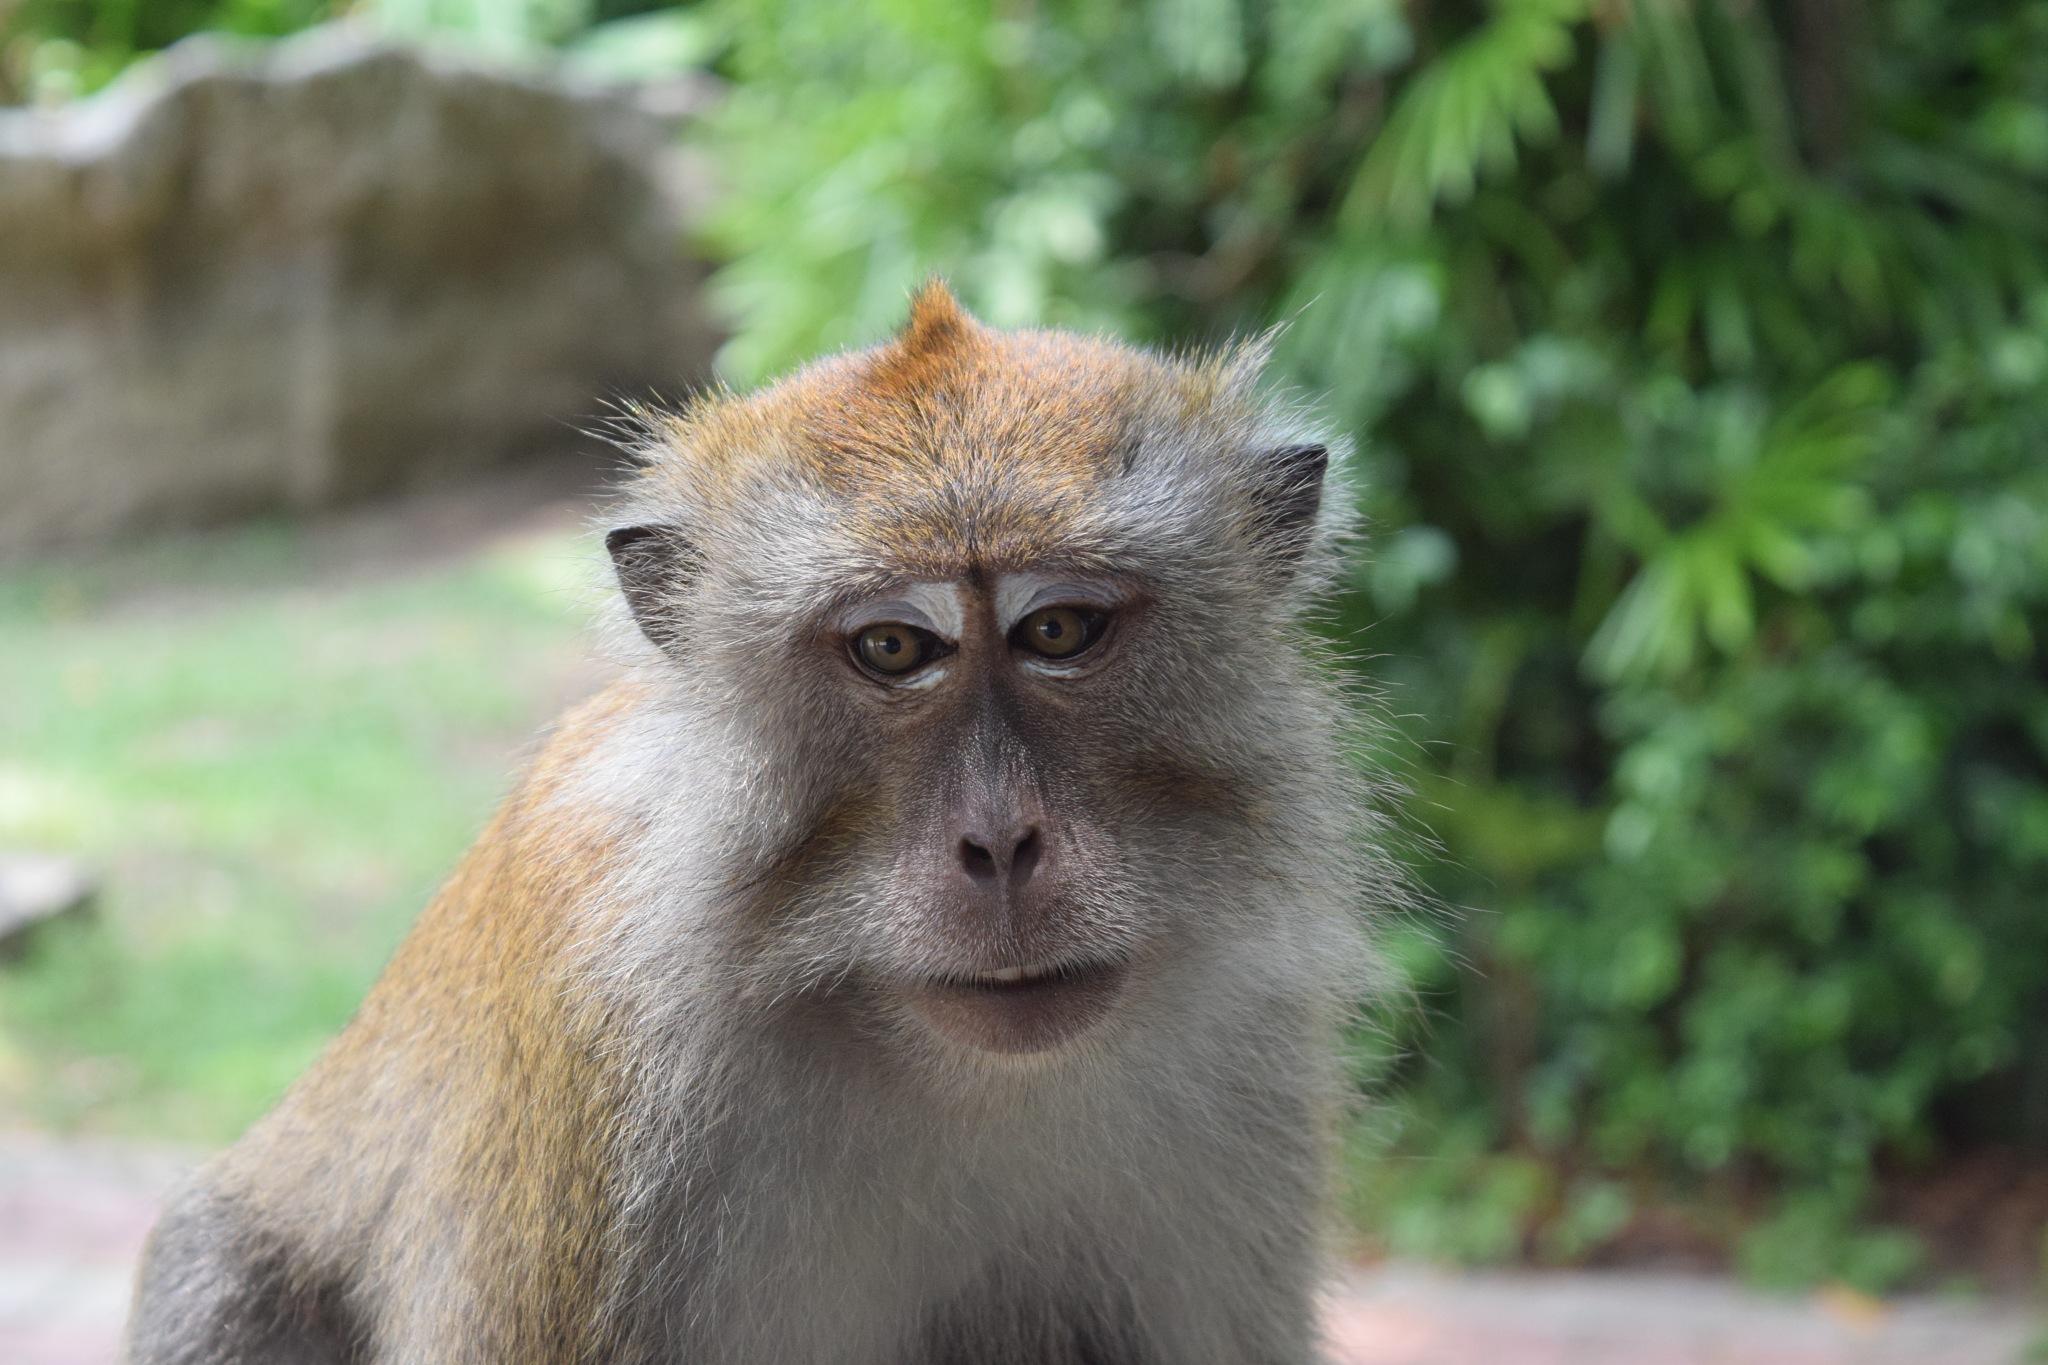 Deceptive Monkey by Jason Murphy